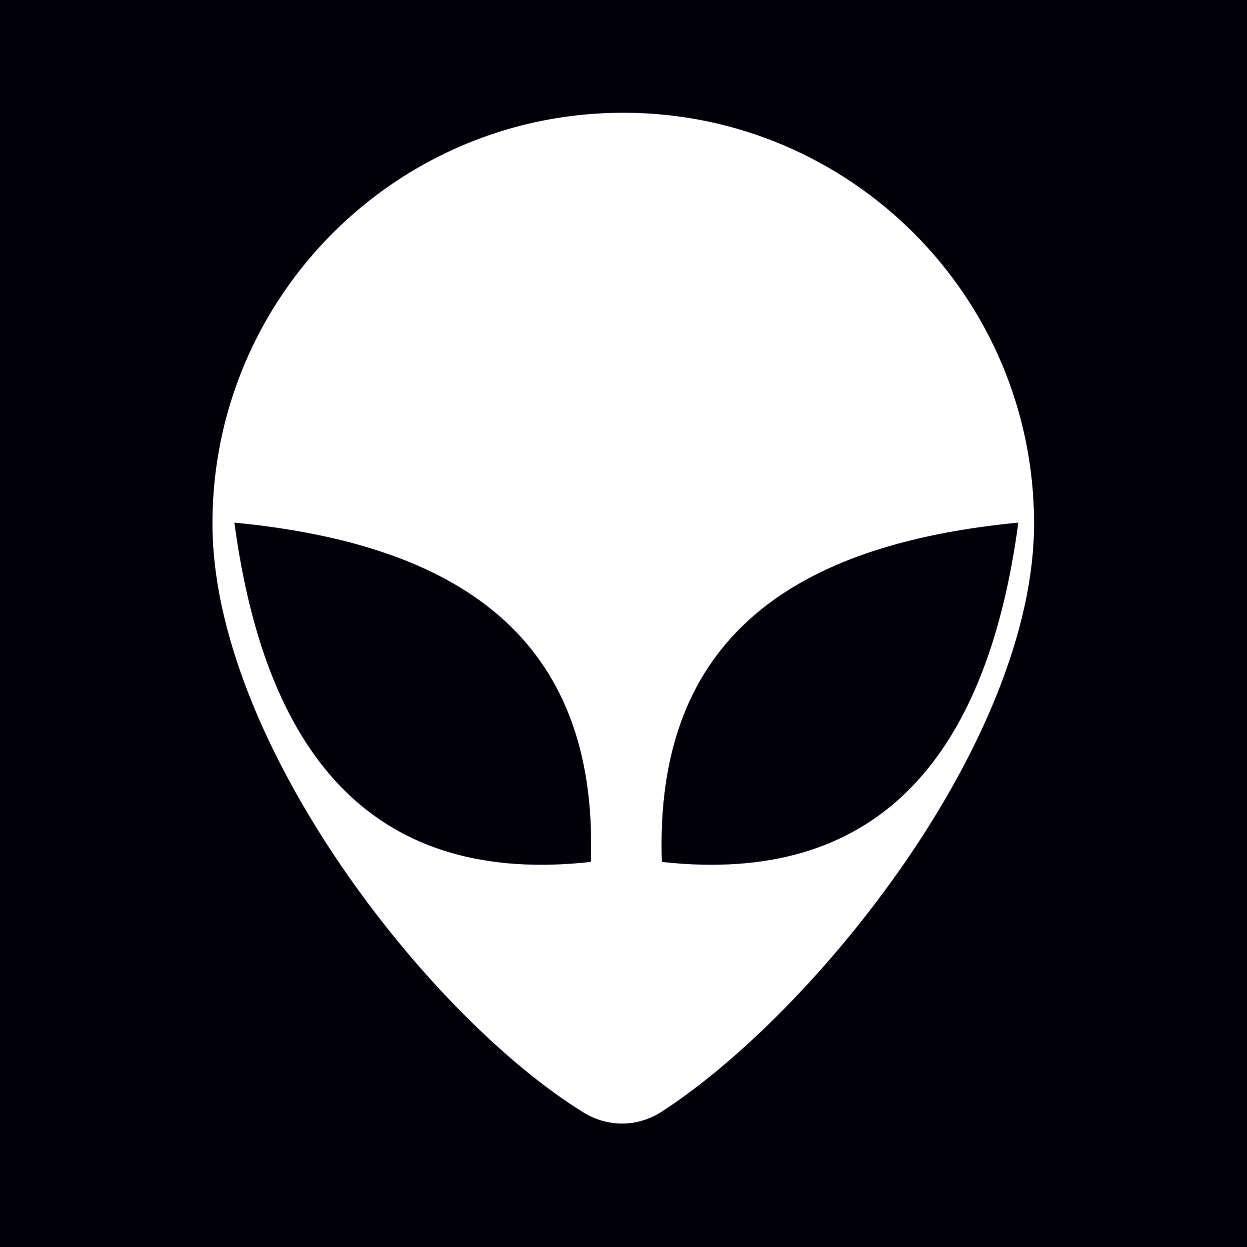 Alien svg #1227, Download drawings